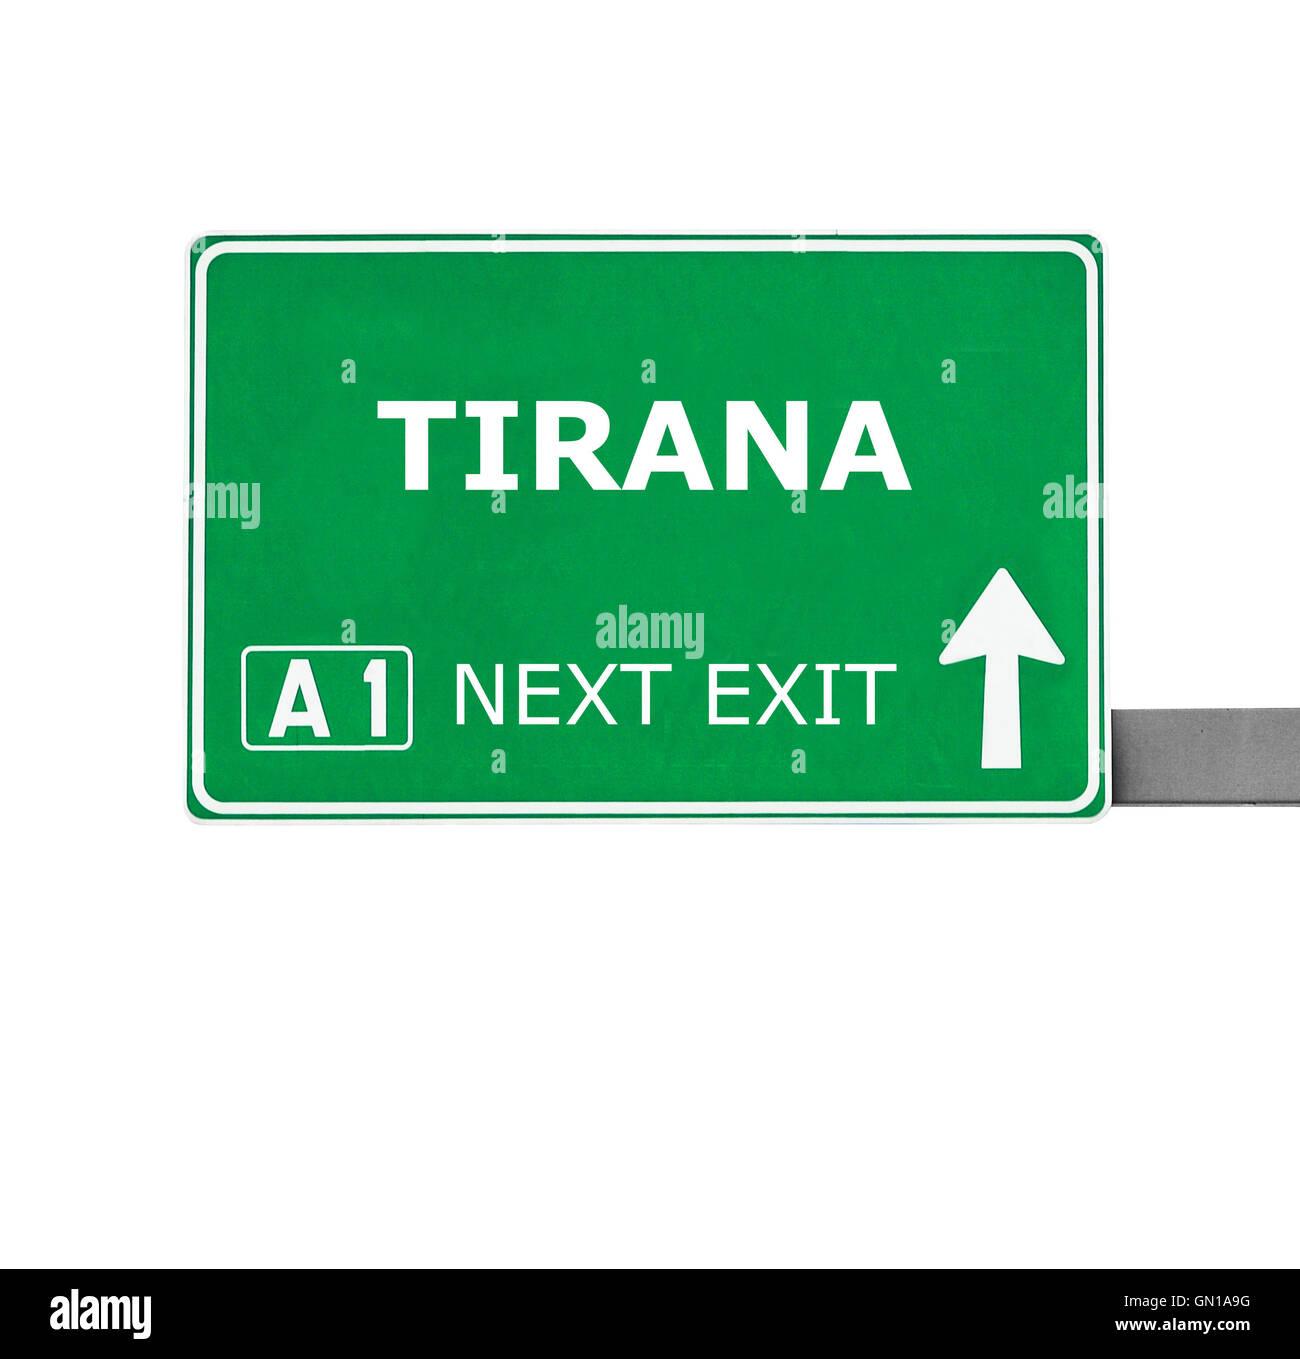 TIRANA road sign isolated on white - Stock Image